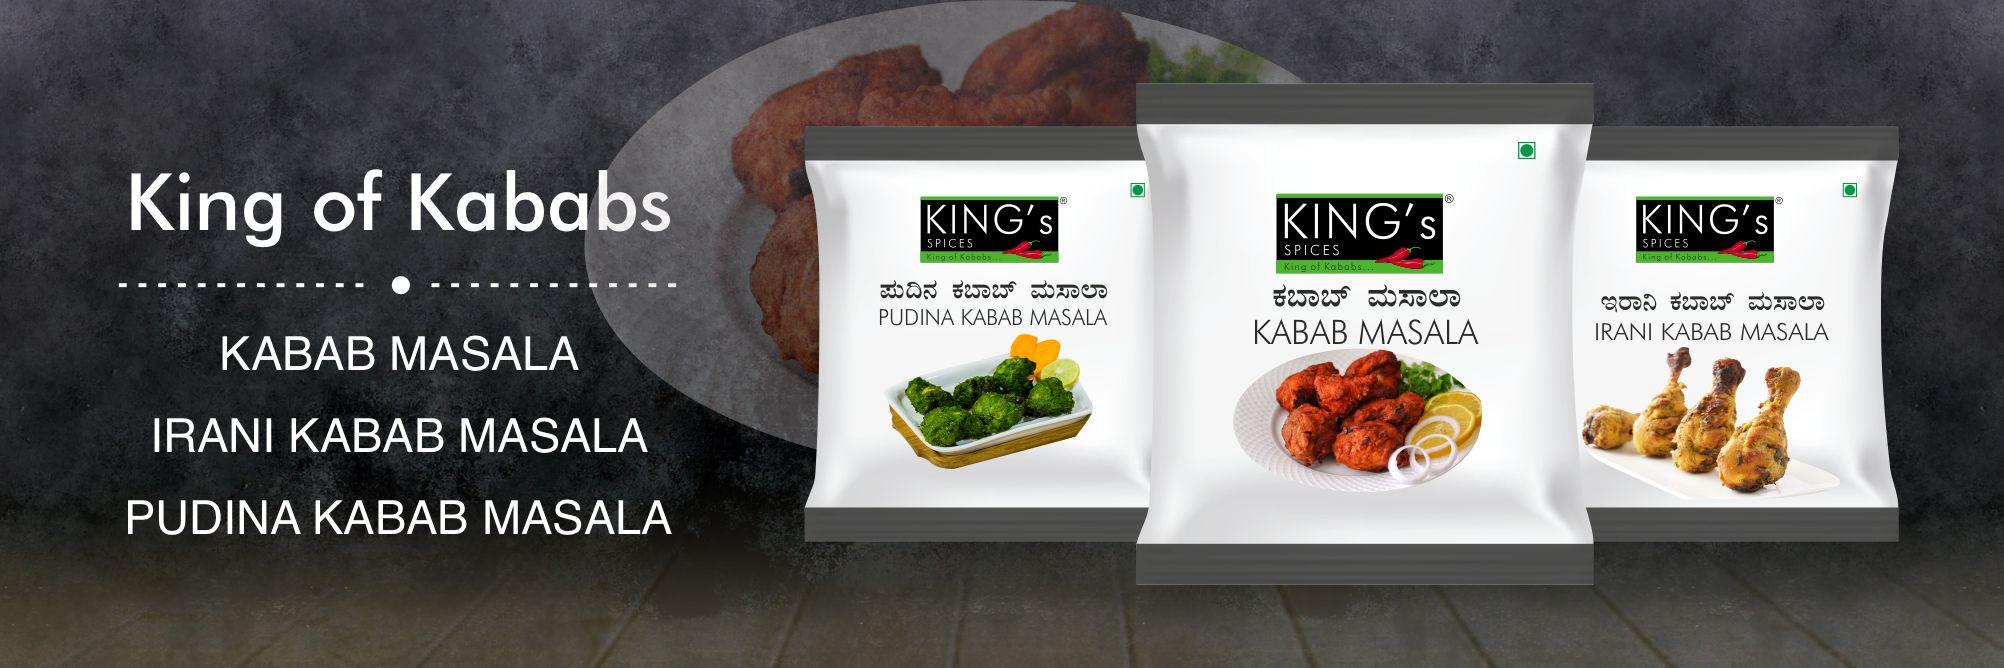 Kings Of kababs